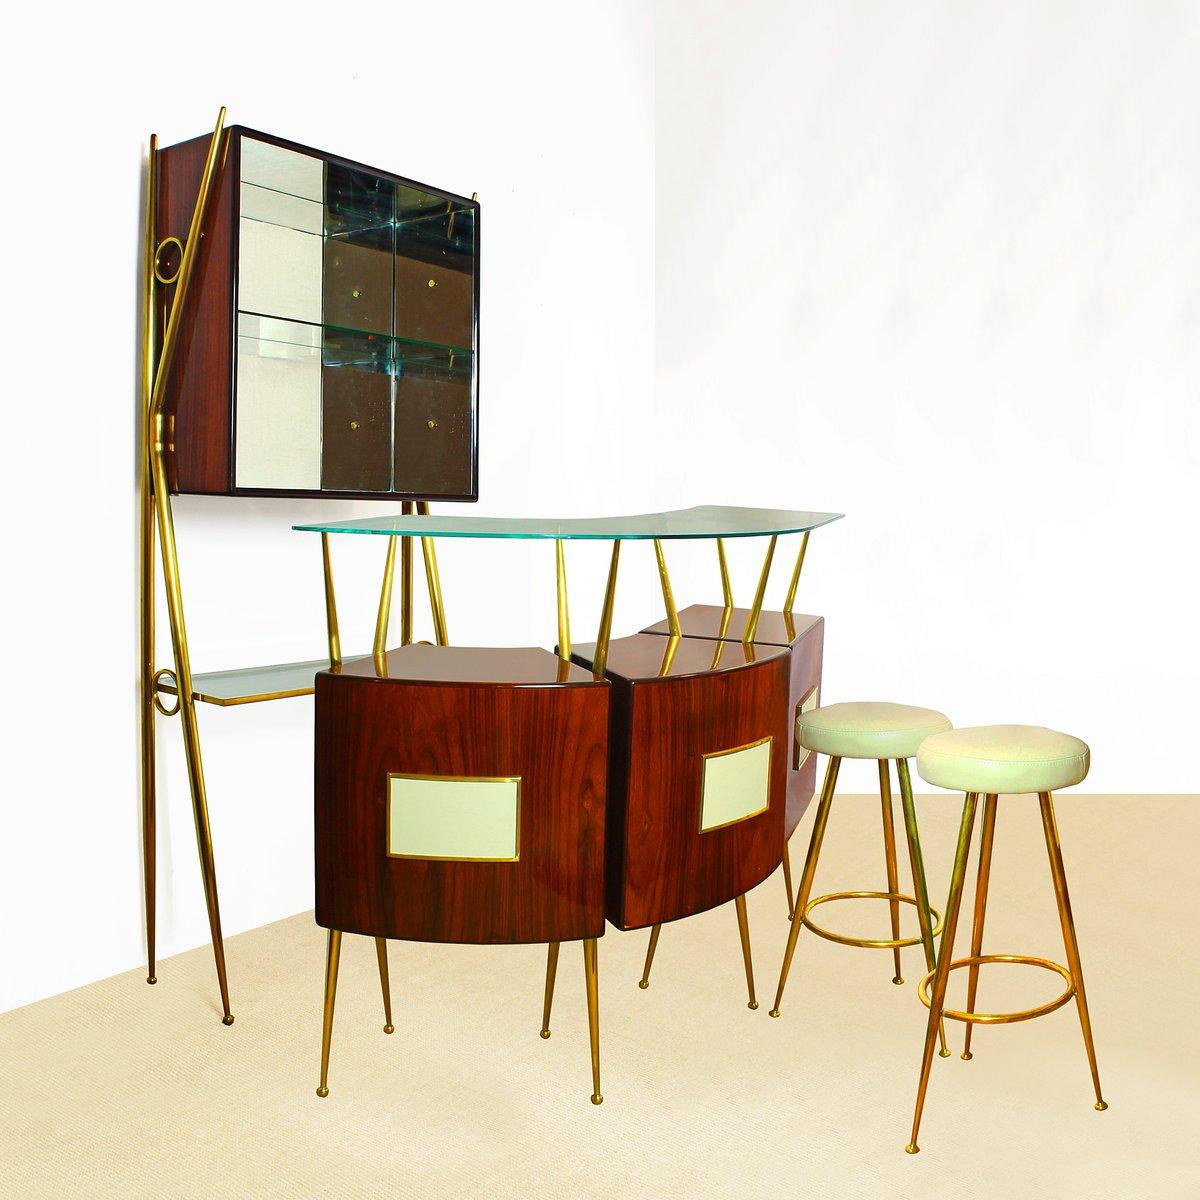 Home Bar Set, 1950s for sale at Pamono